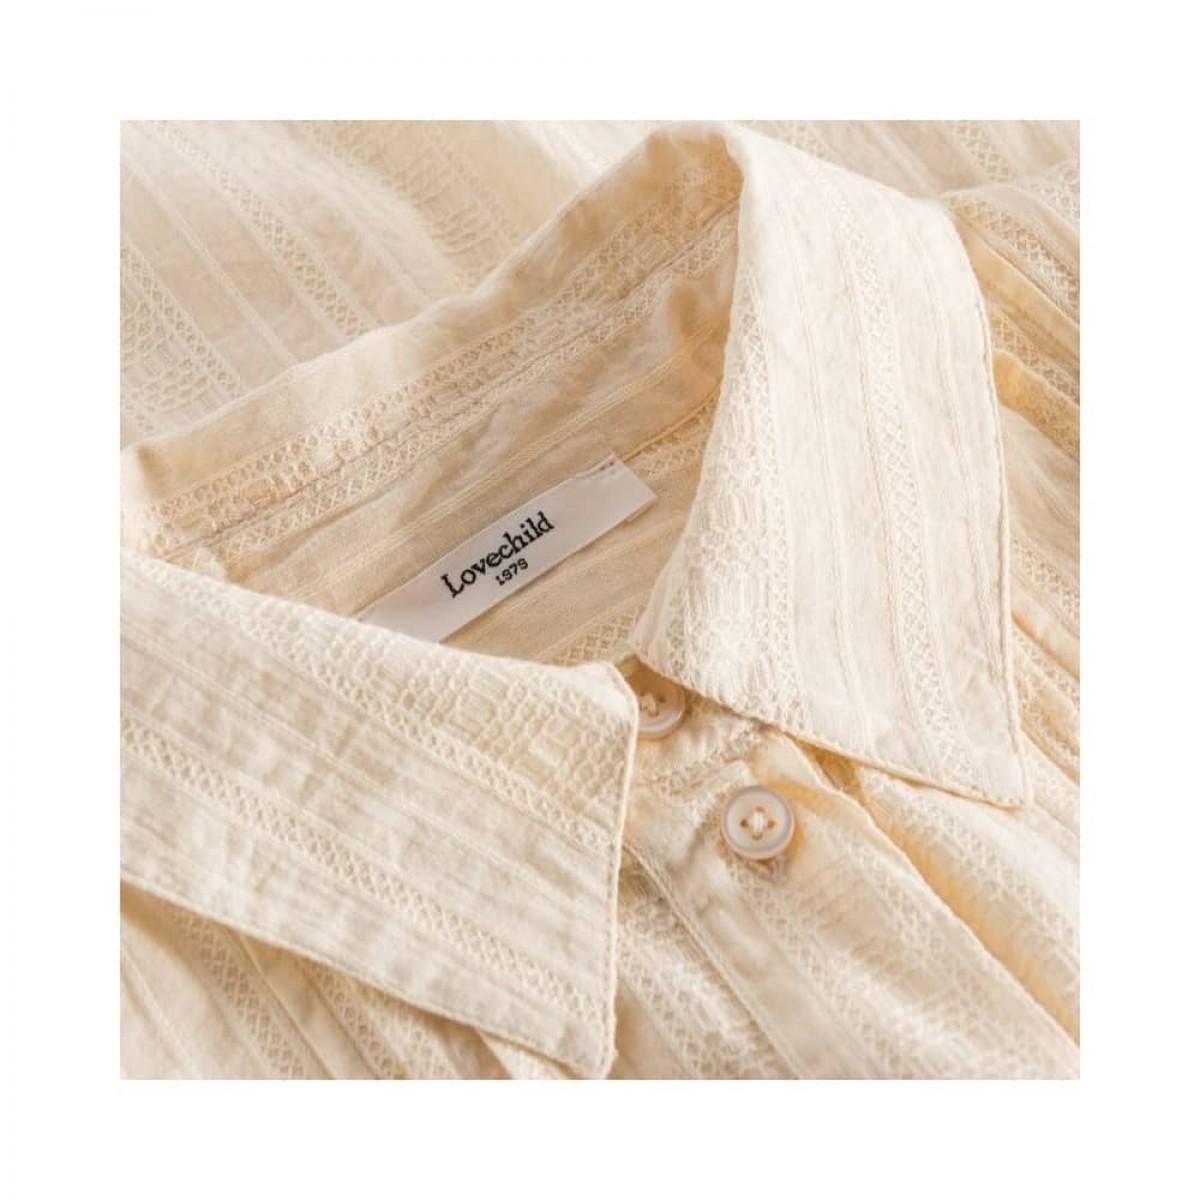 romala shirt - cream - krave detalje